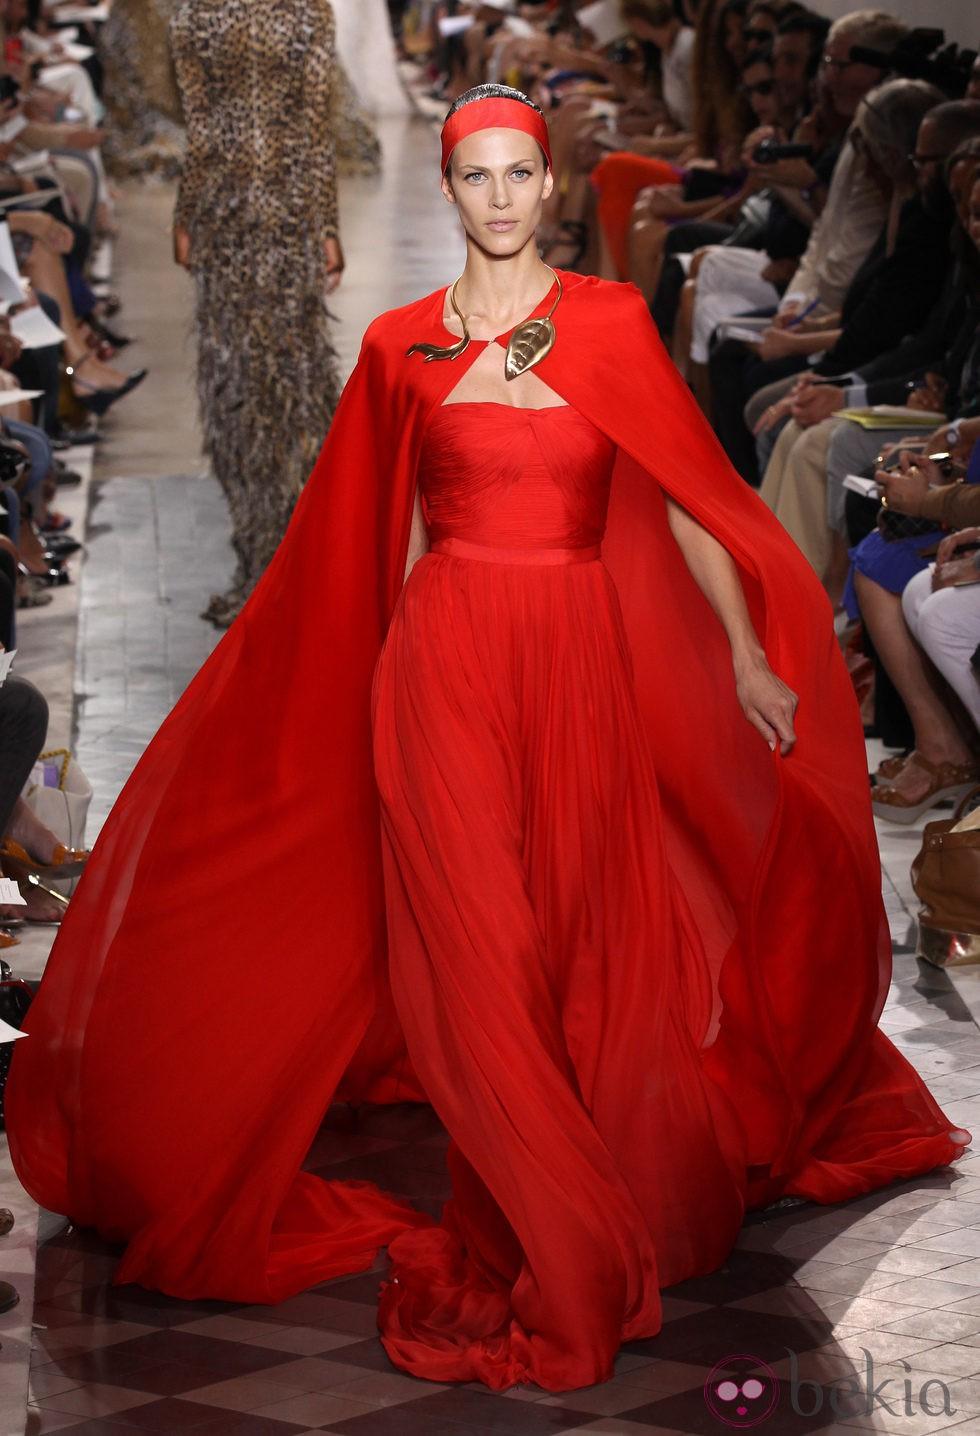 Dise o rojo alta costura de giambattista valli fotos en - Diseno alta costura ...